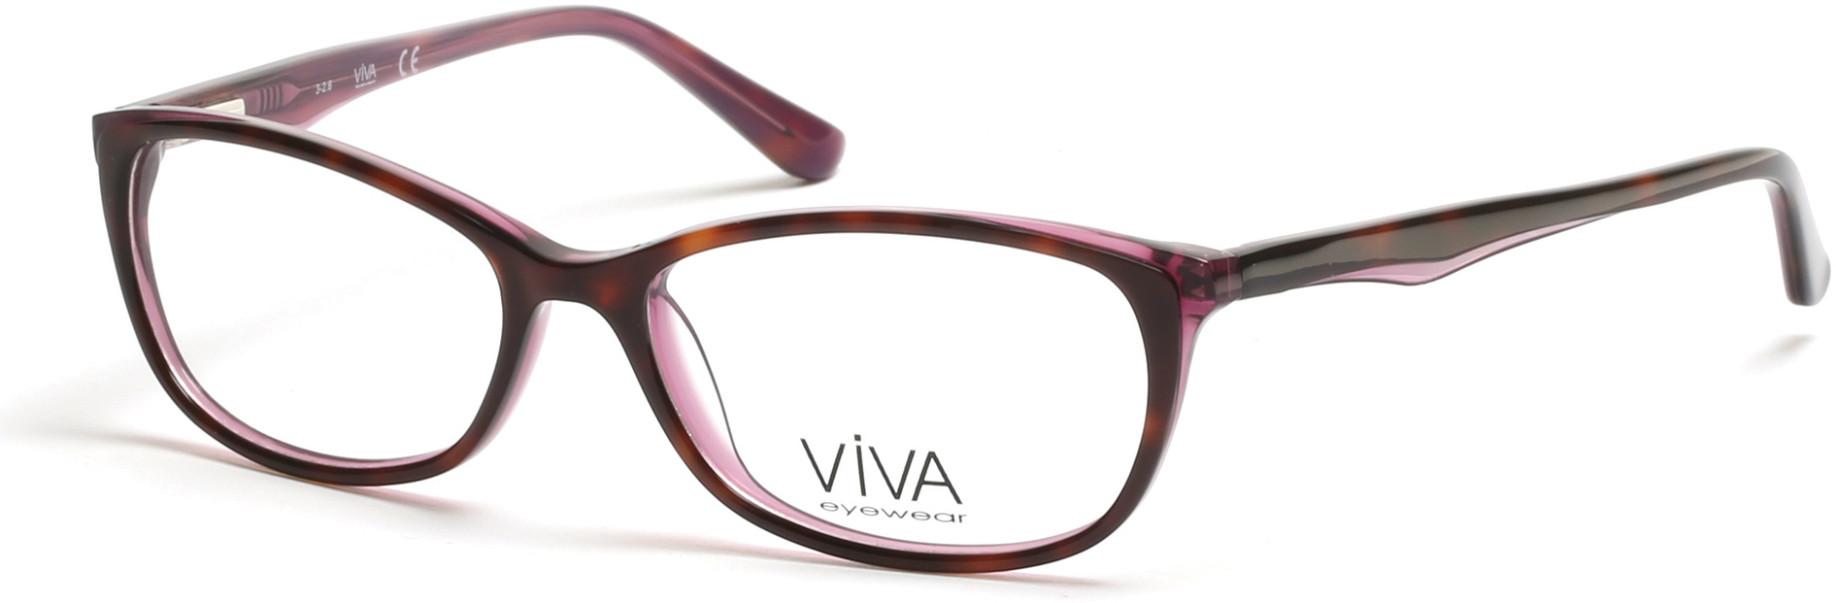 VIVA VV4505 style-color 056 - Havana / Other